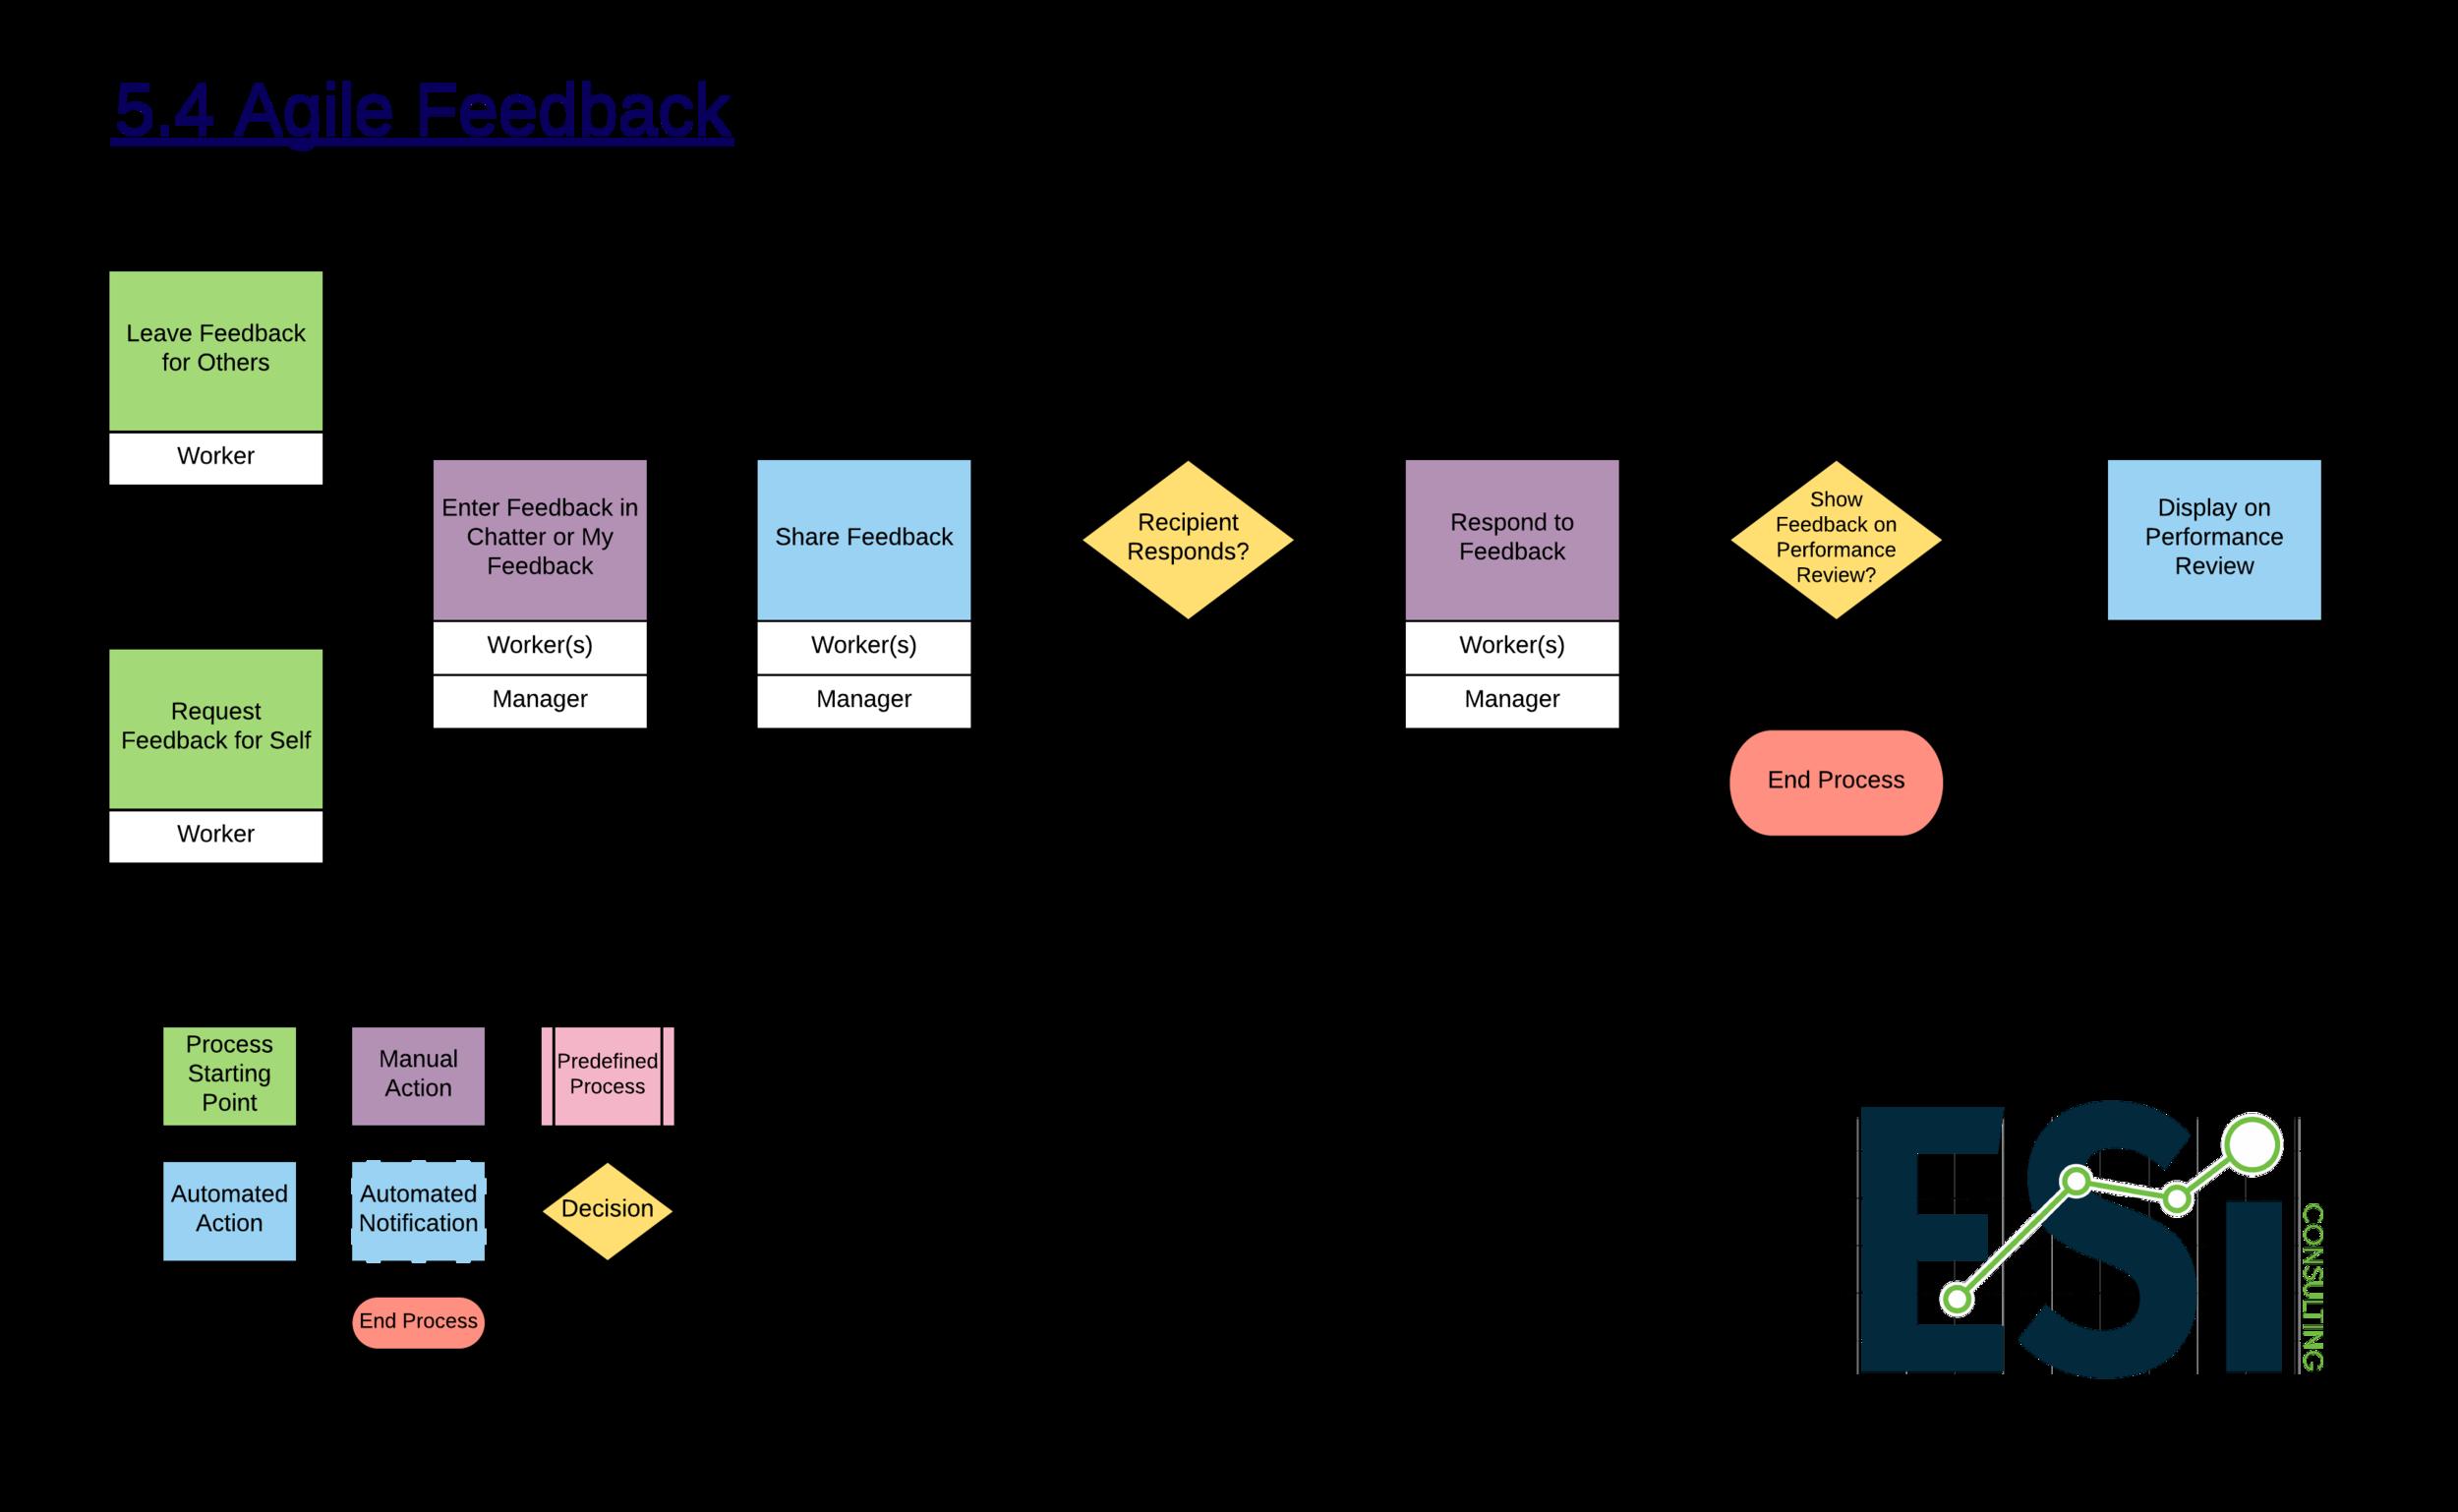 5.4 Agile Feedback -